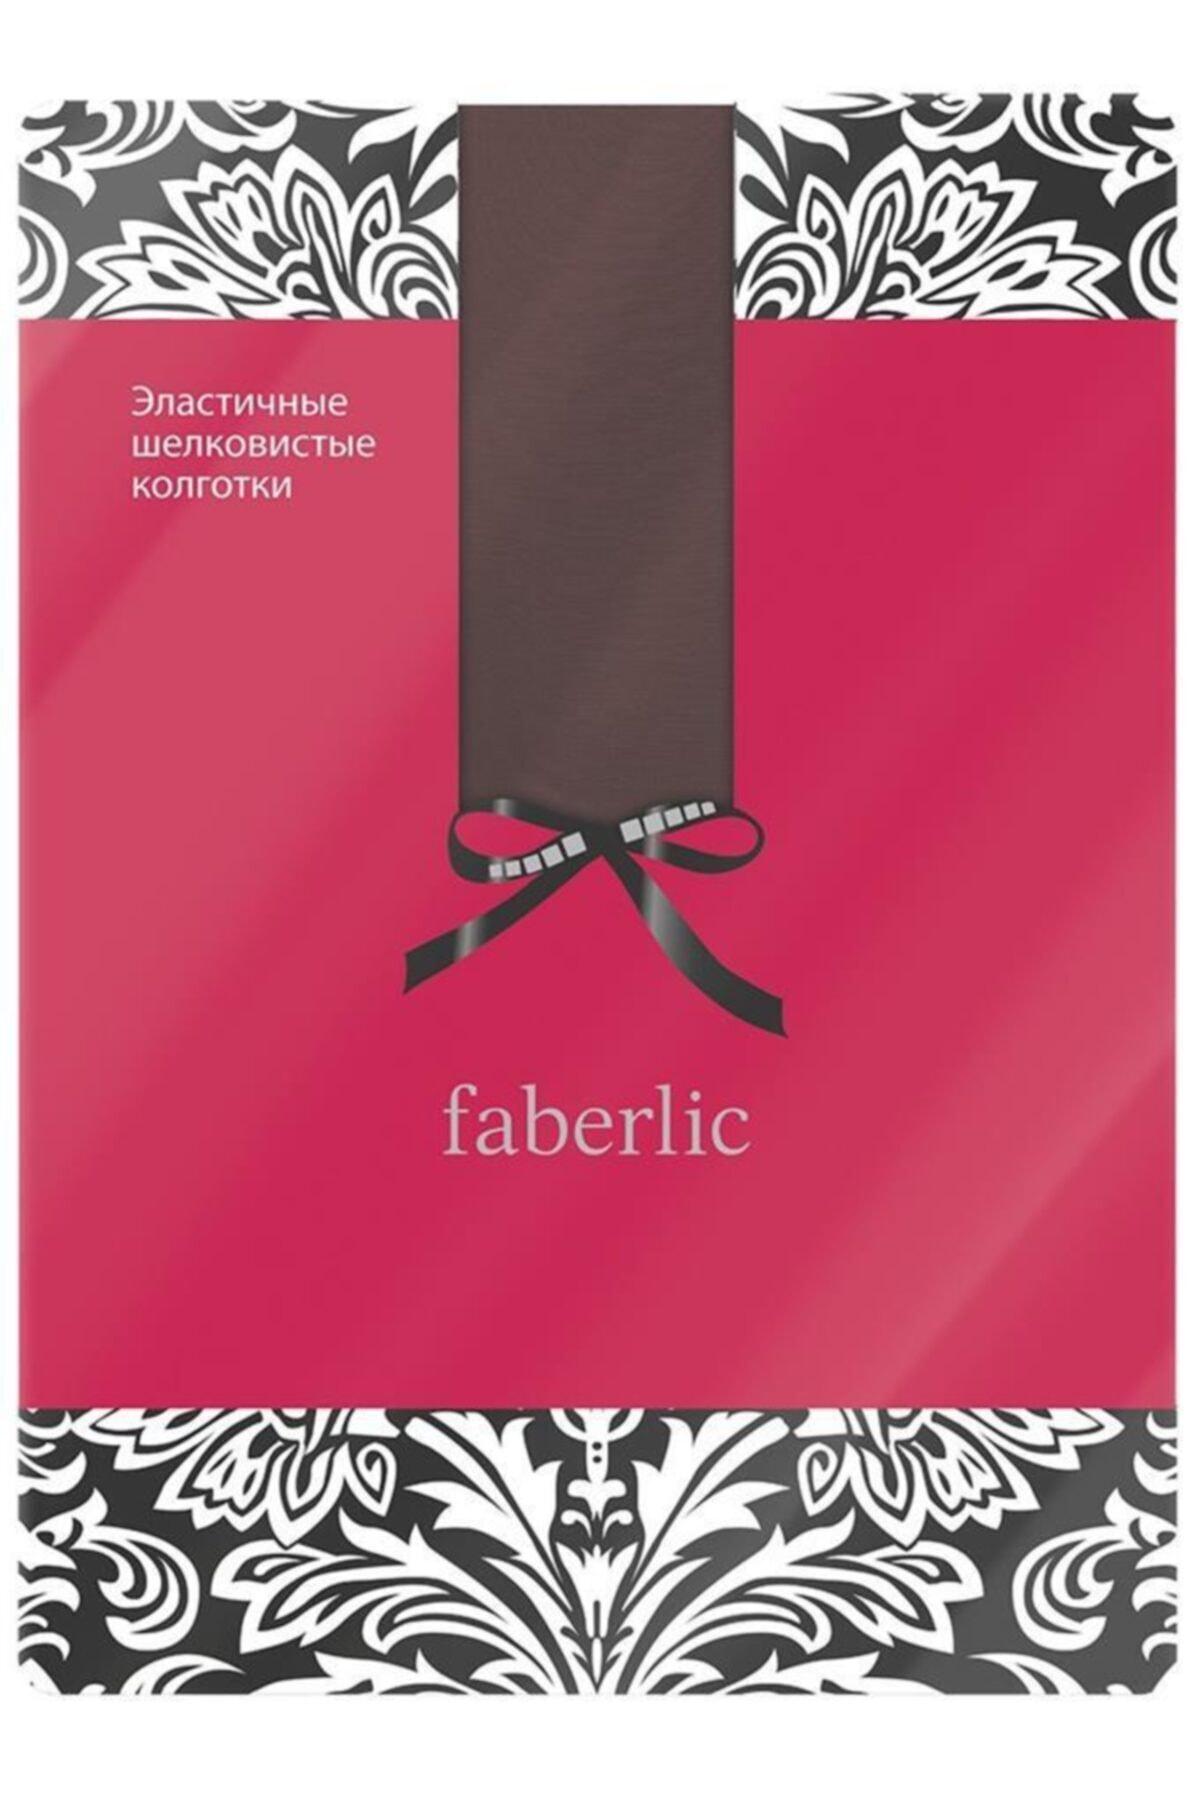 Faberlic Kahverengi Külotlu Çorap L 82764 1